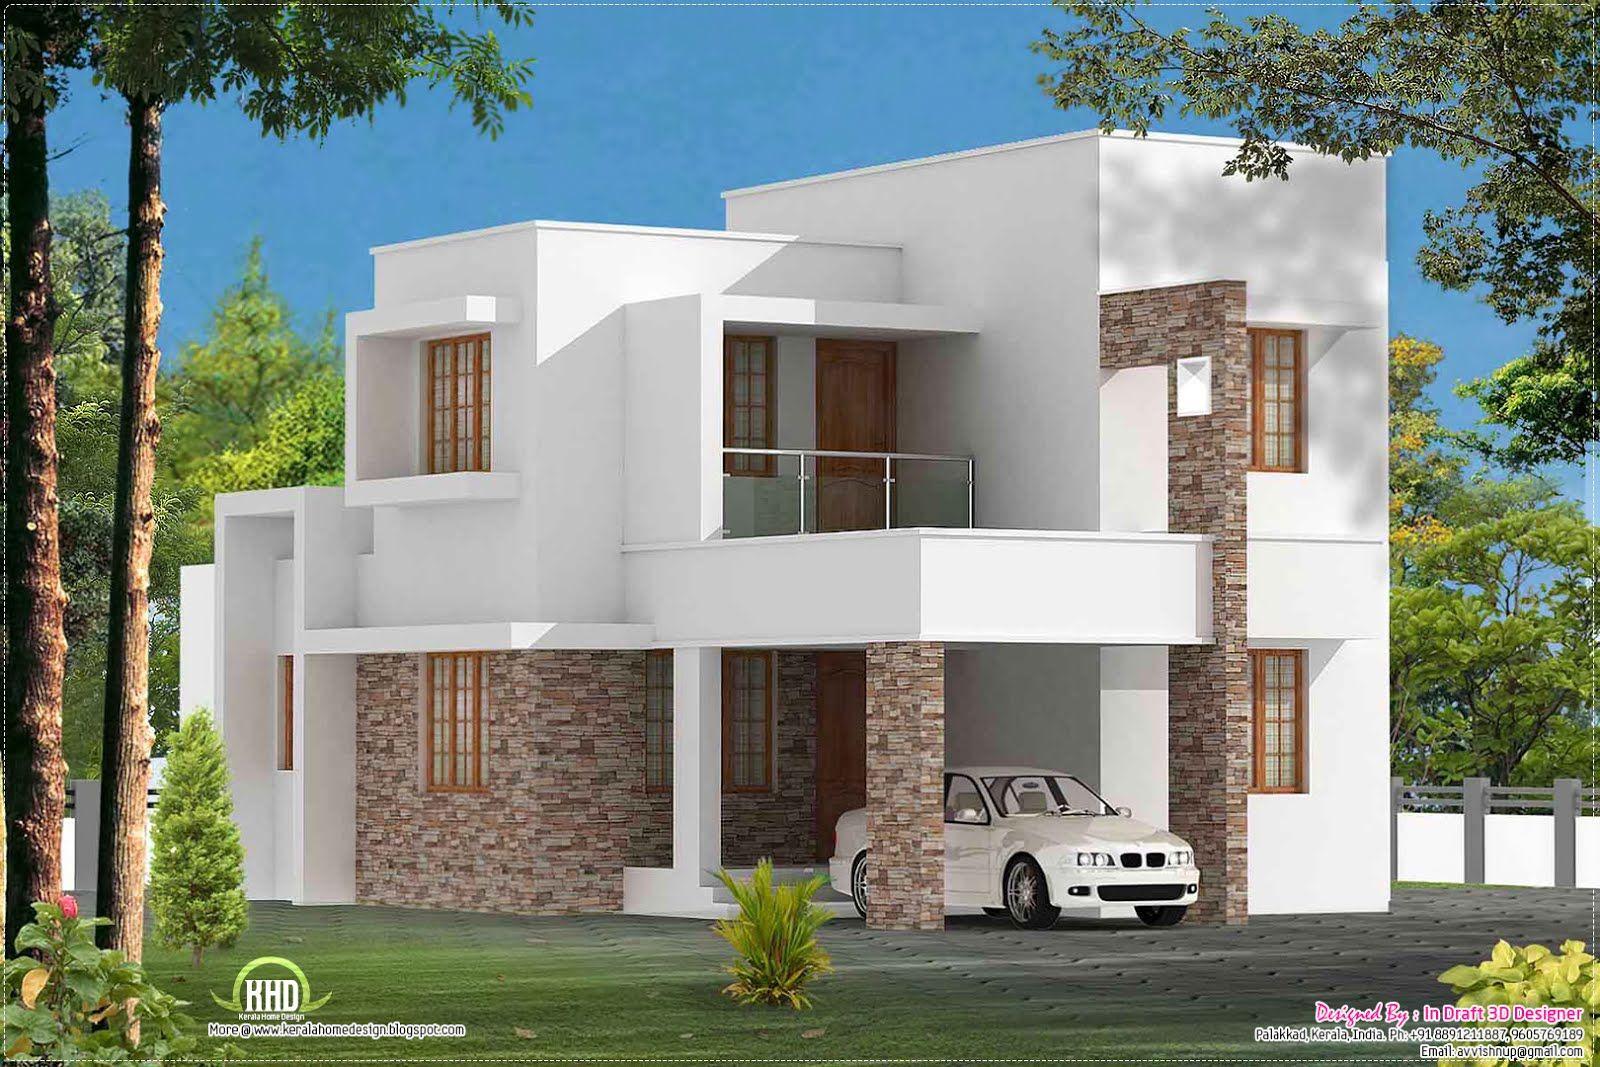 Simple House Design Google Search Architecture Pinterest